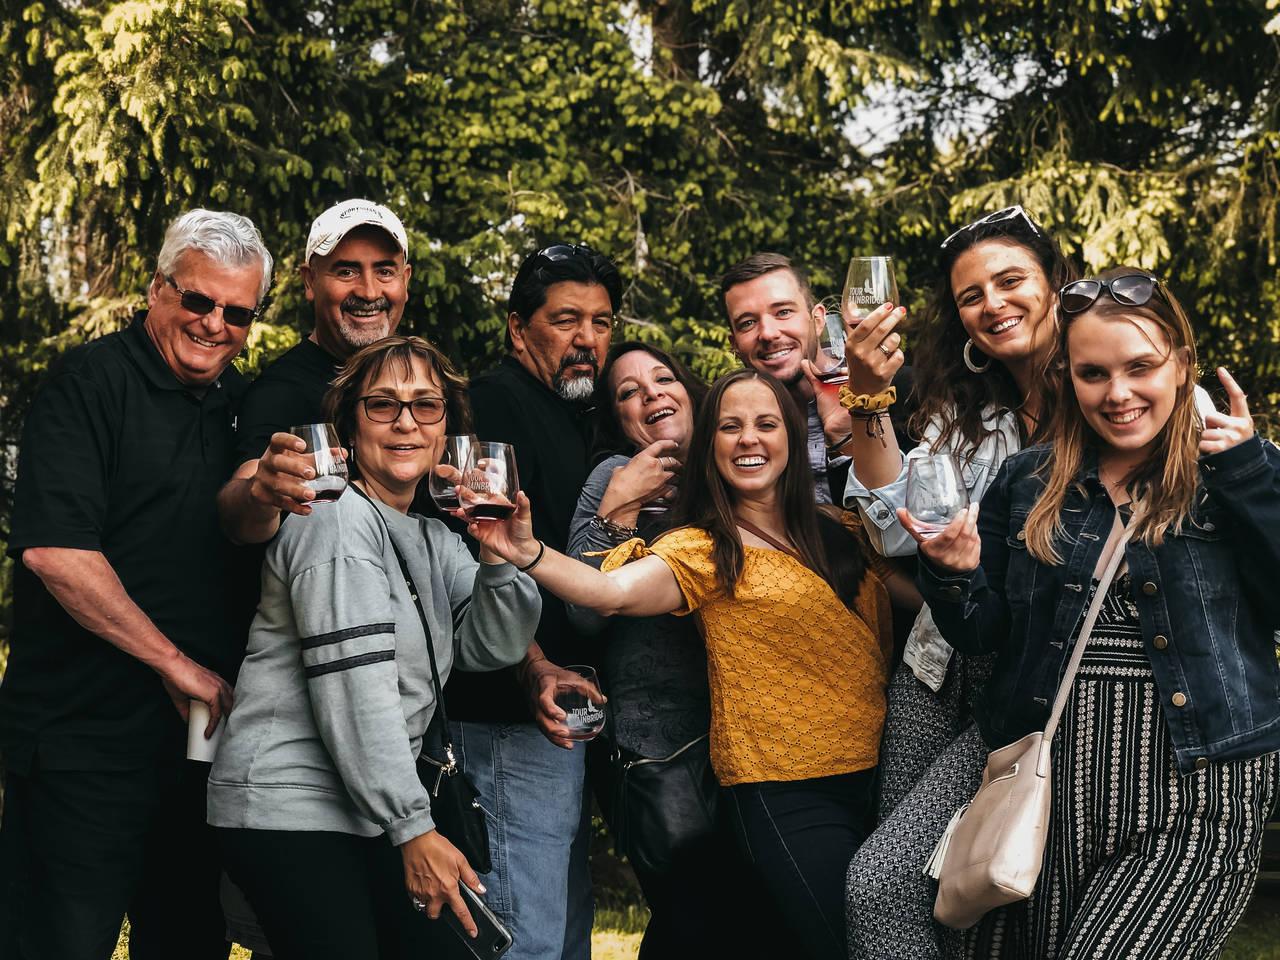 Tour Bainbridge Winery Tour - Best Wine Tasting in